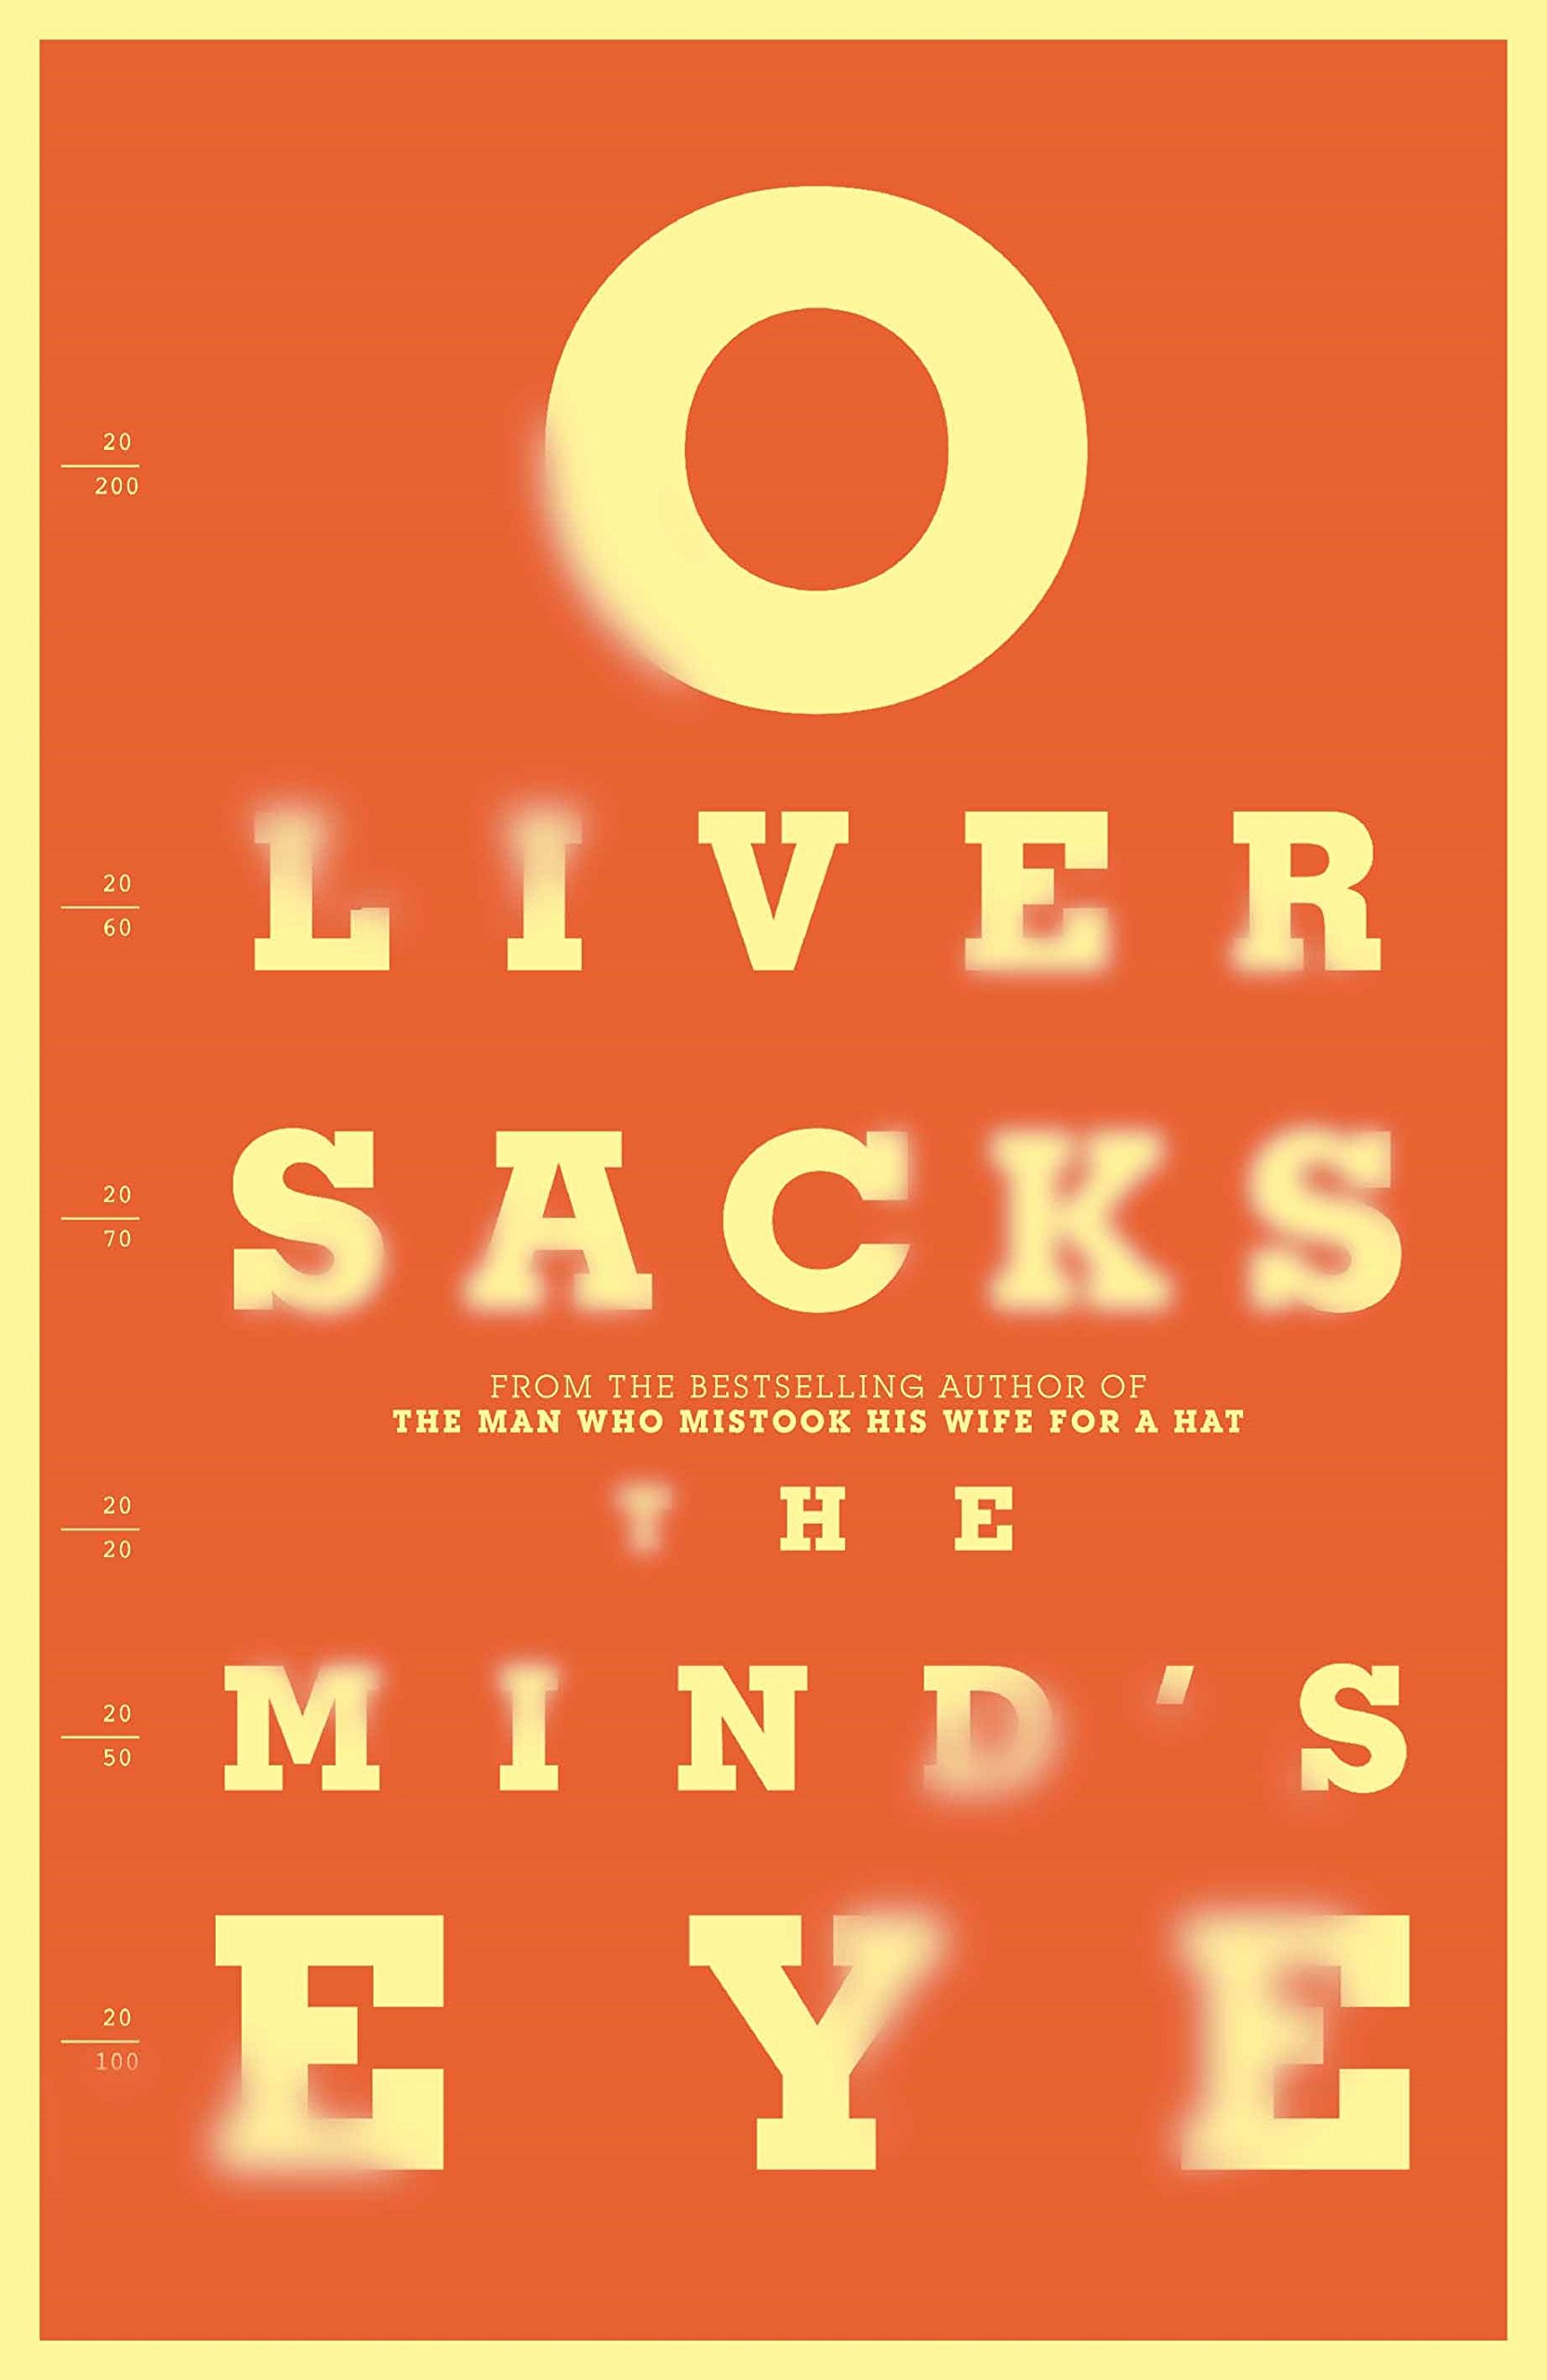 Oliver Sacks, The Mind's Eye